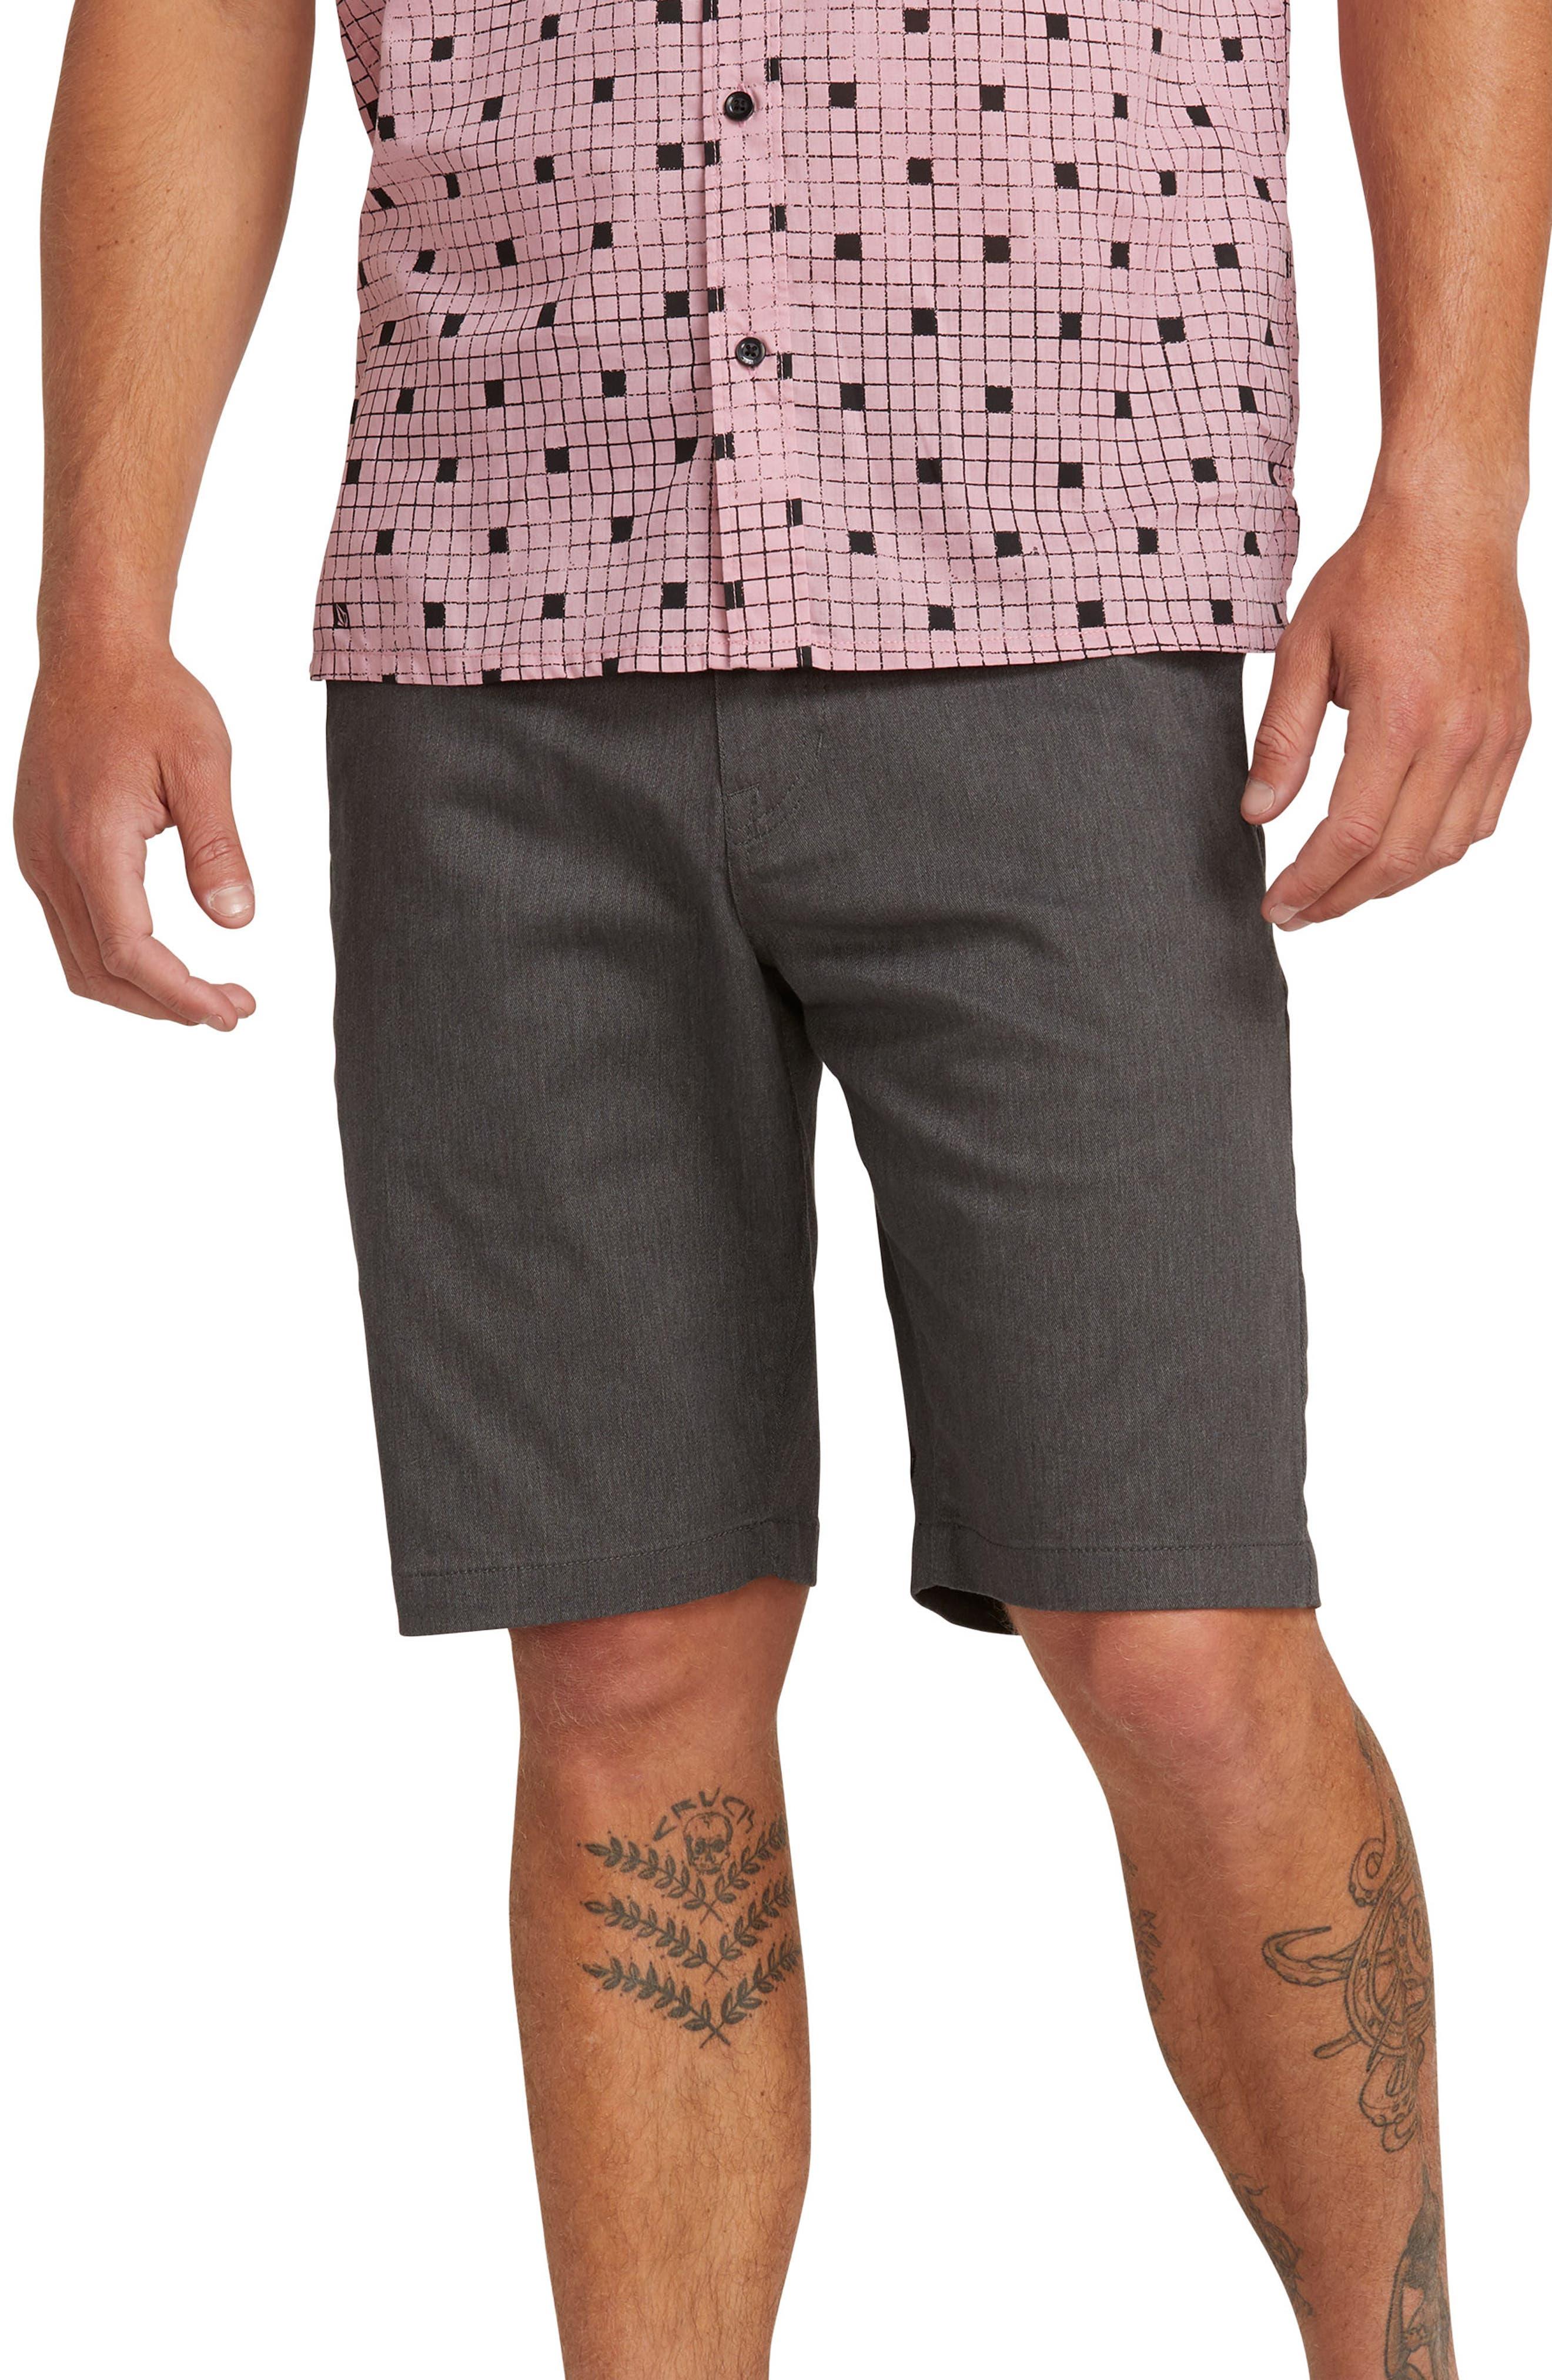 VOLCOM 'Modern' Stretch Chino Shorts, Main, color, 021